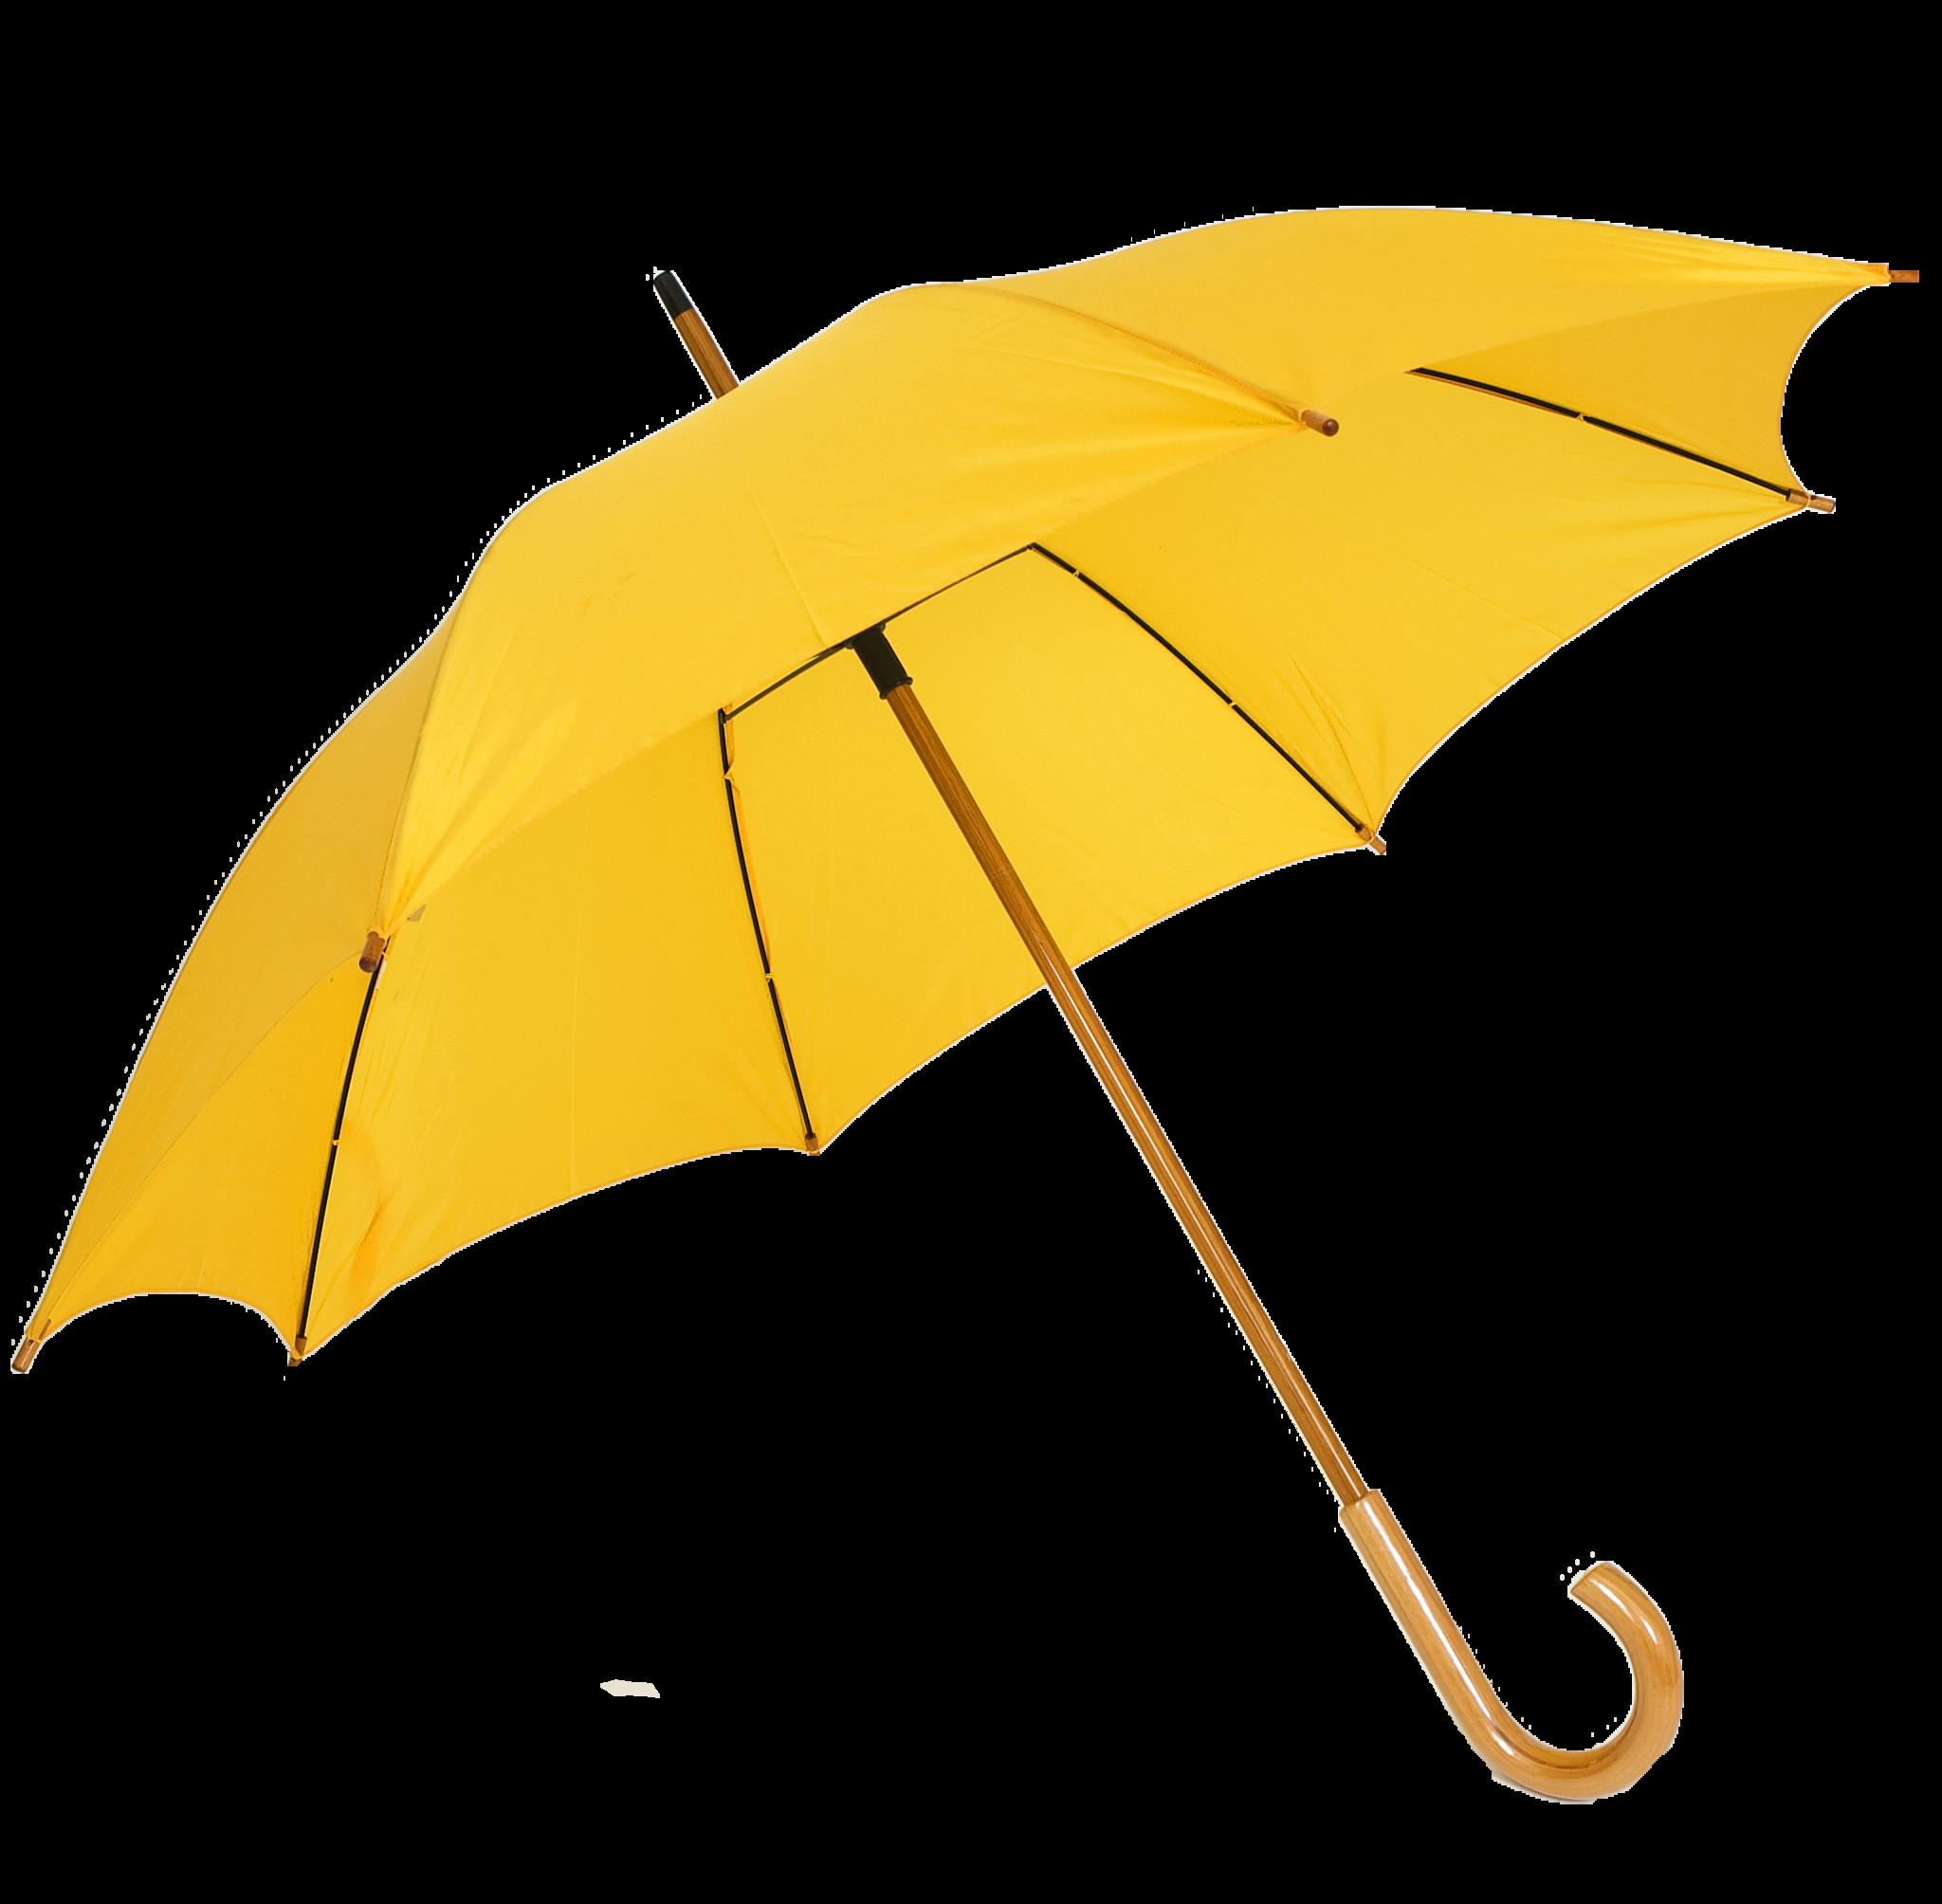 Umbrella Png PNG Image